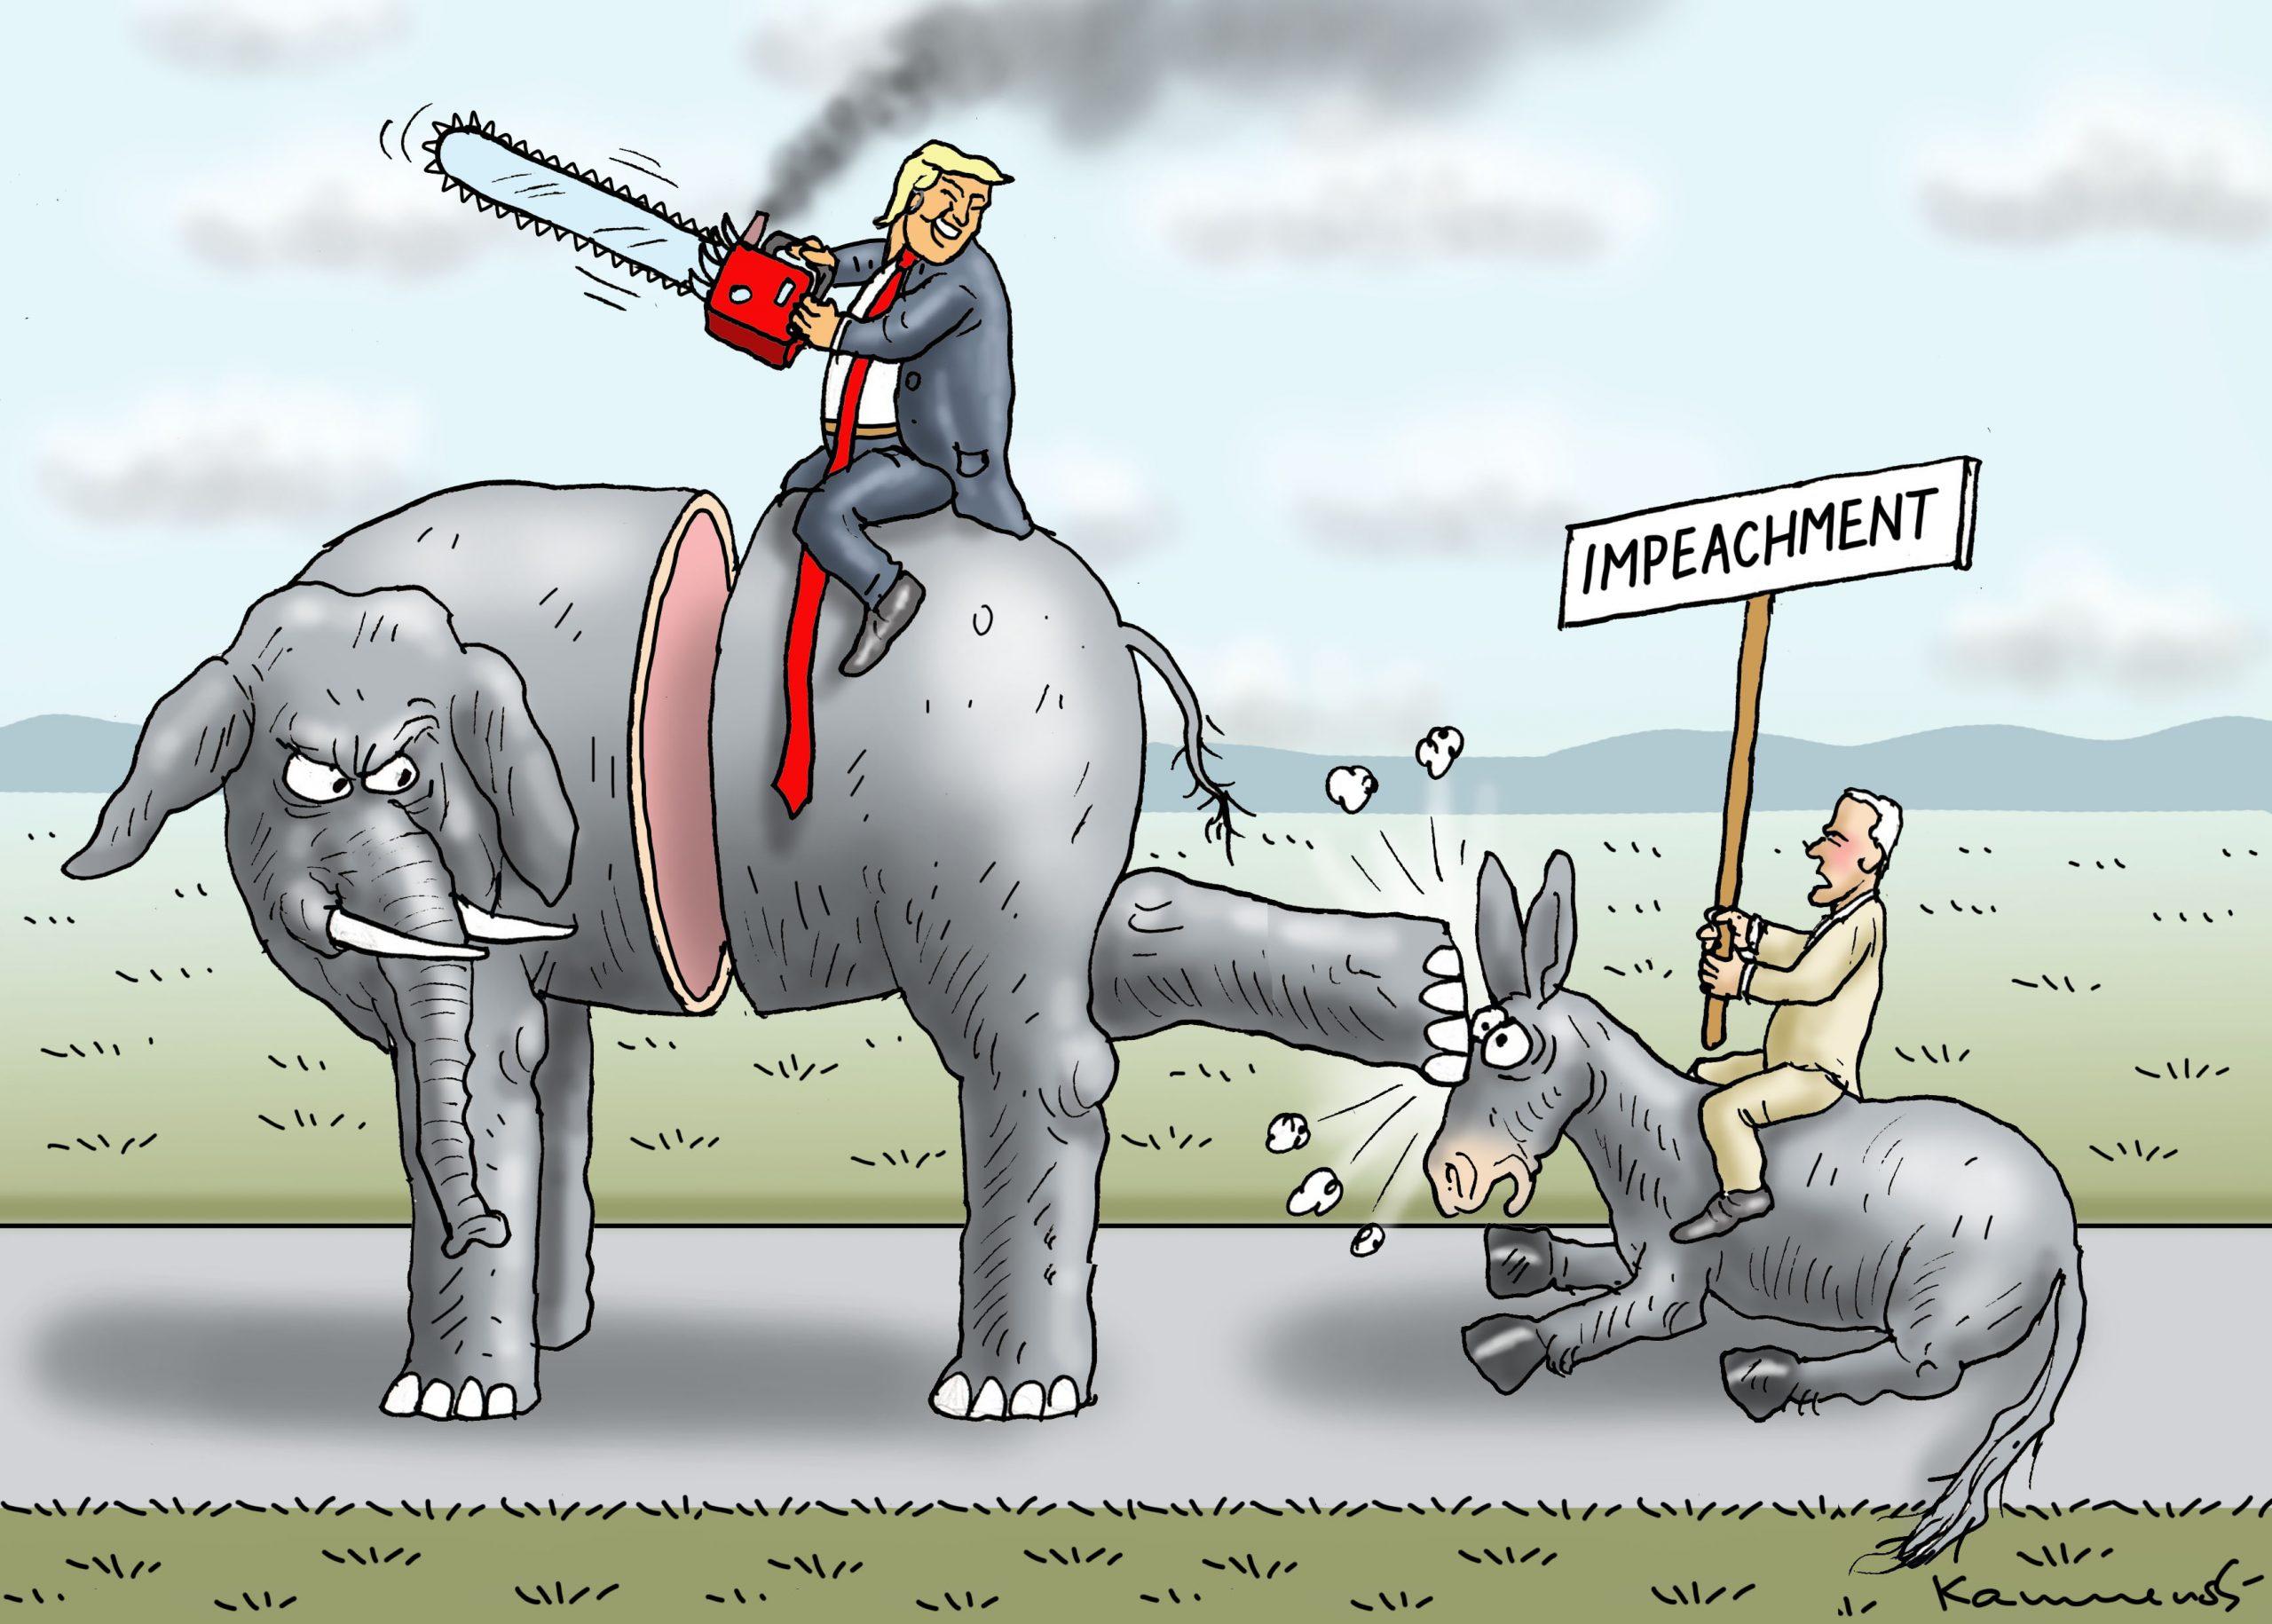 Trump impeached. Marian Kamensky